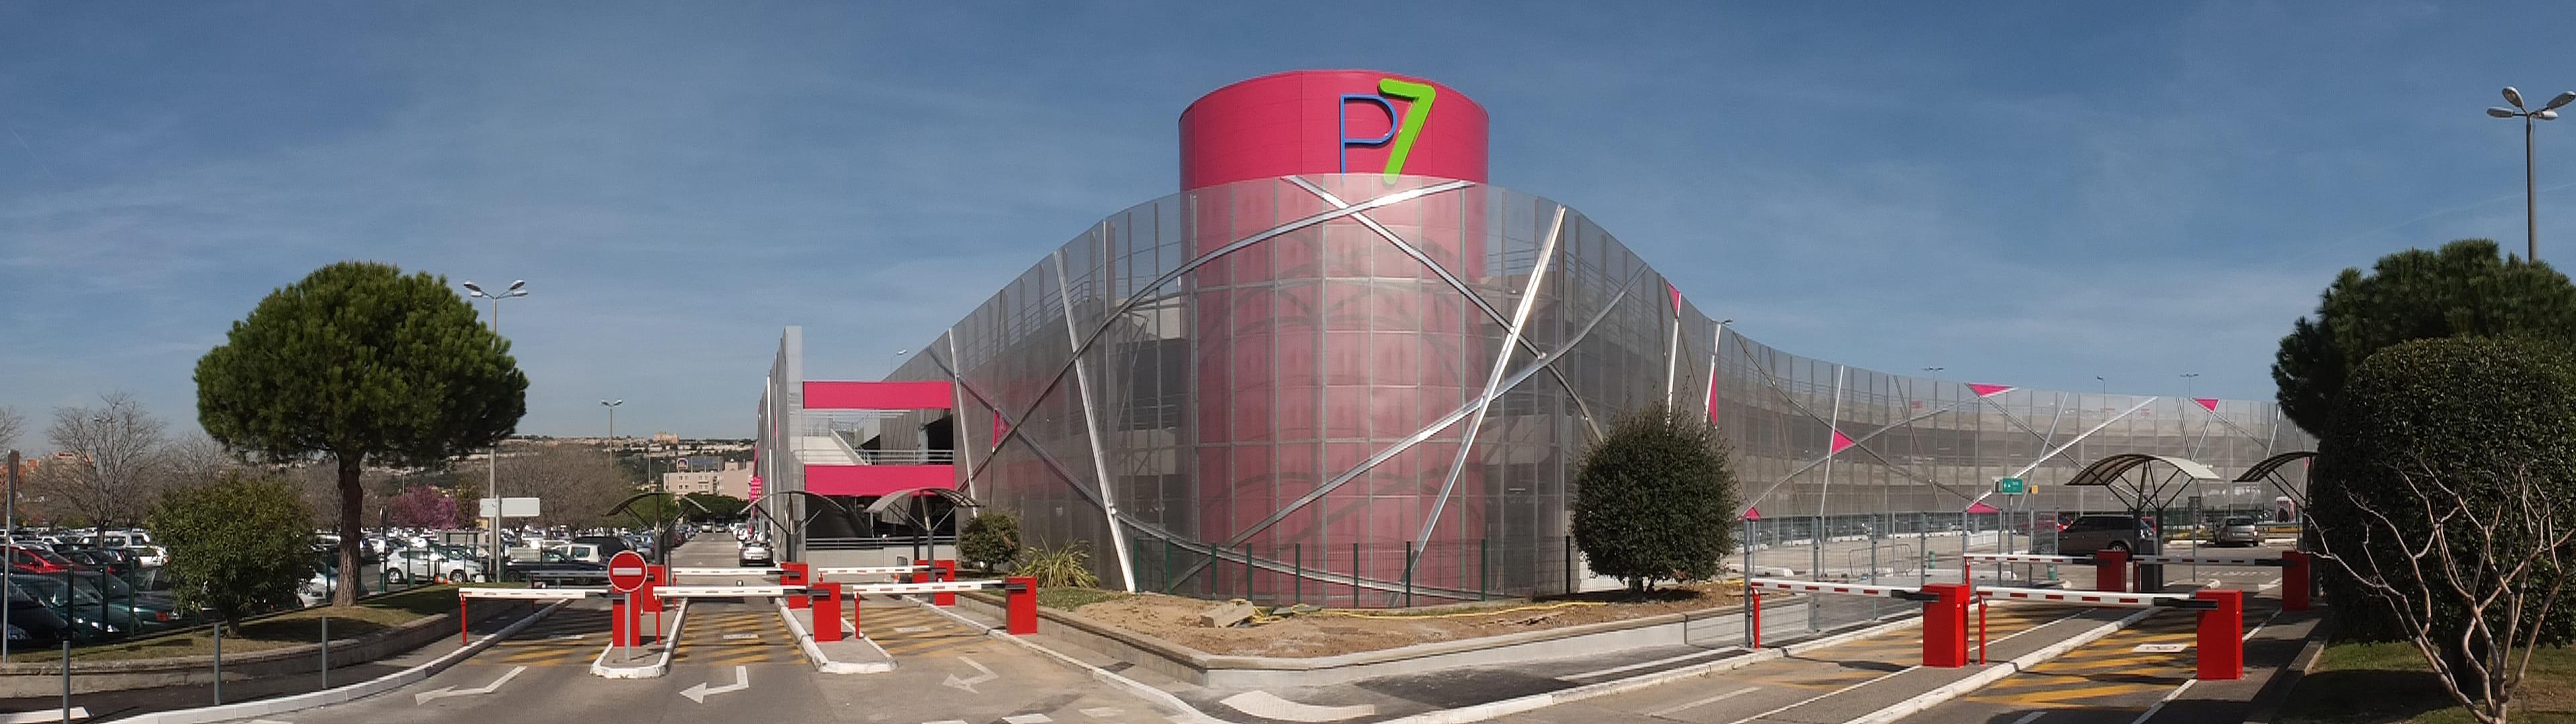 Aéroport Marseille-Provence P7 – Marignane (13)